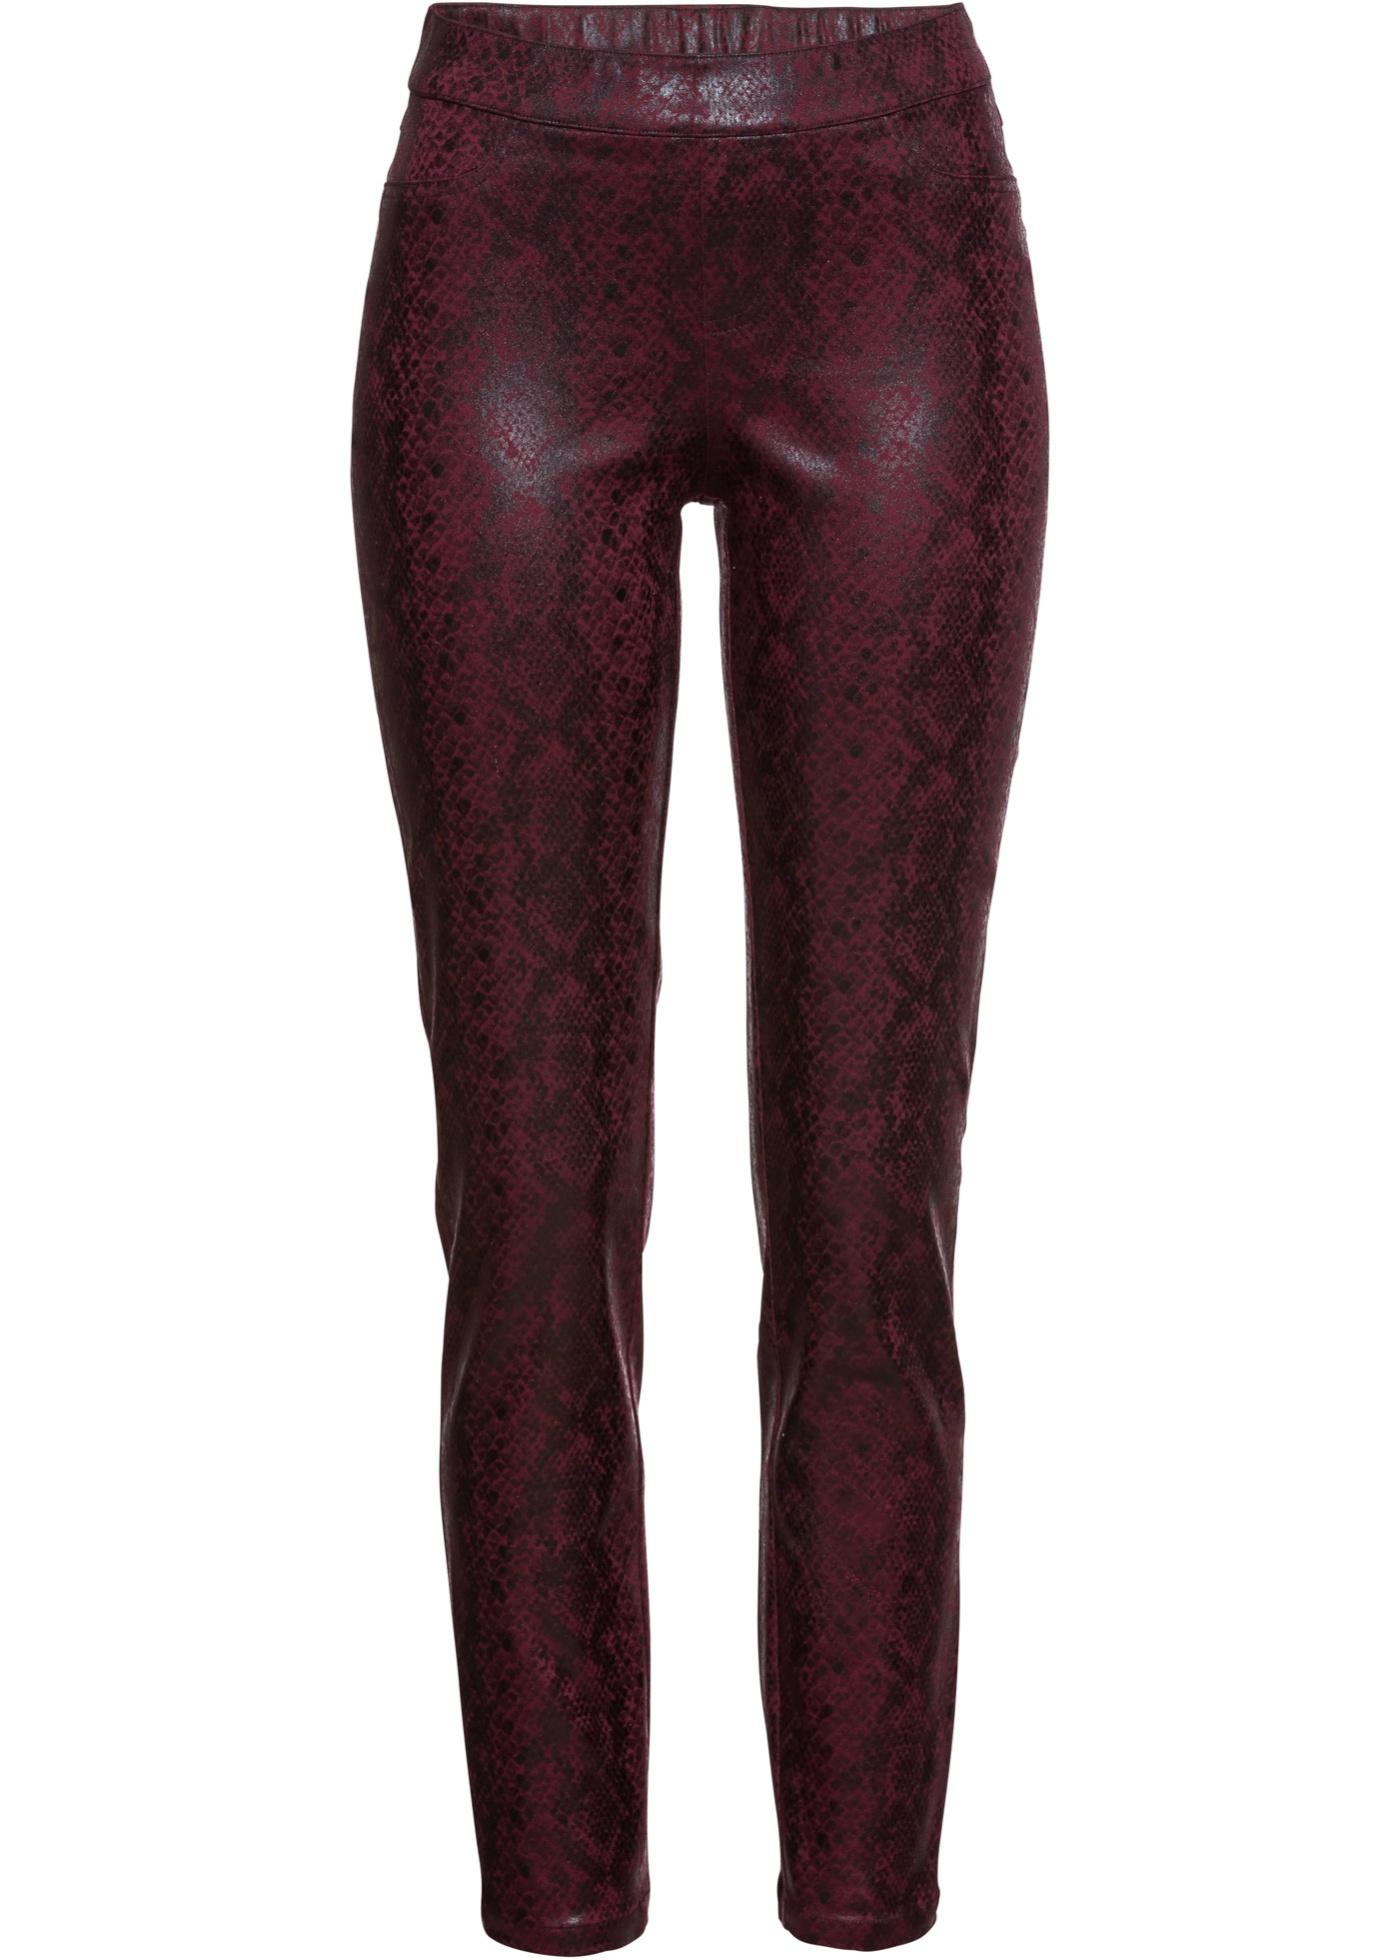 Hosen - Hose mit Schlangenprint › bonprix › pink  - Onlineshop Bonprix